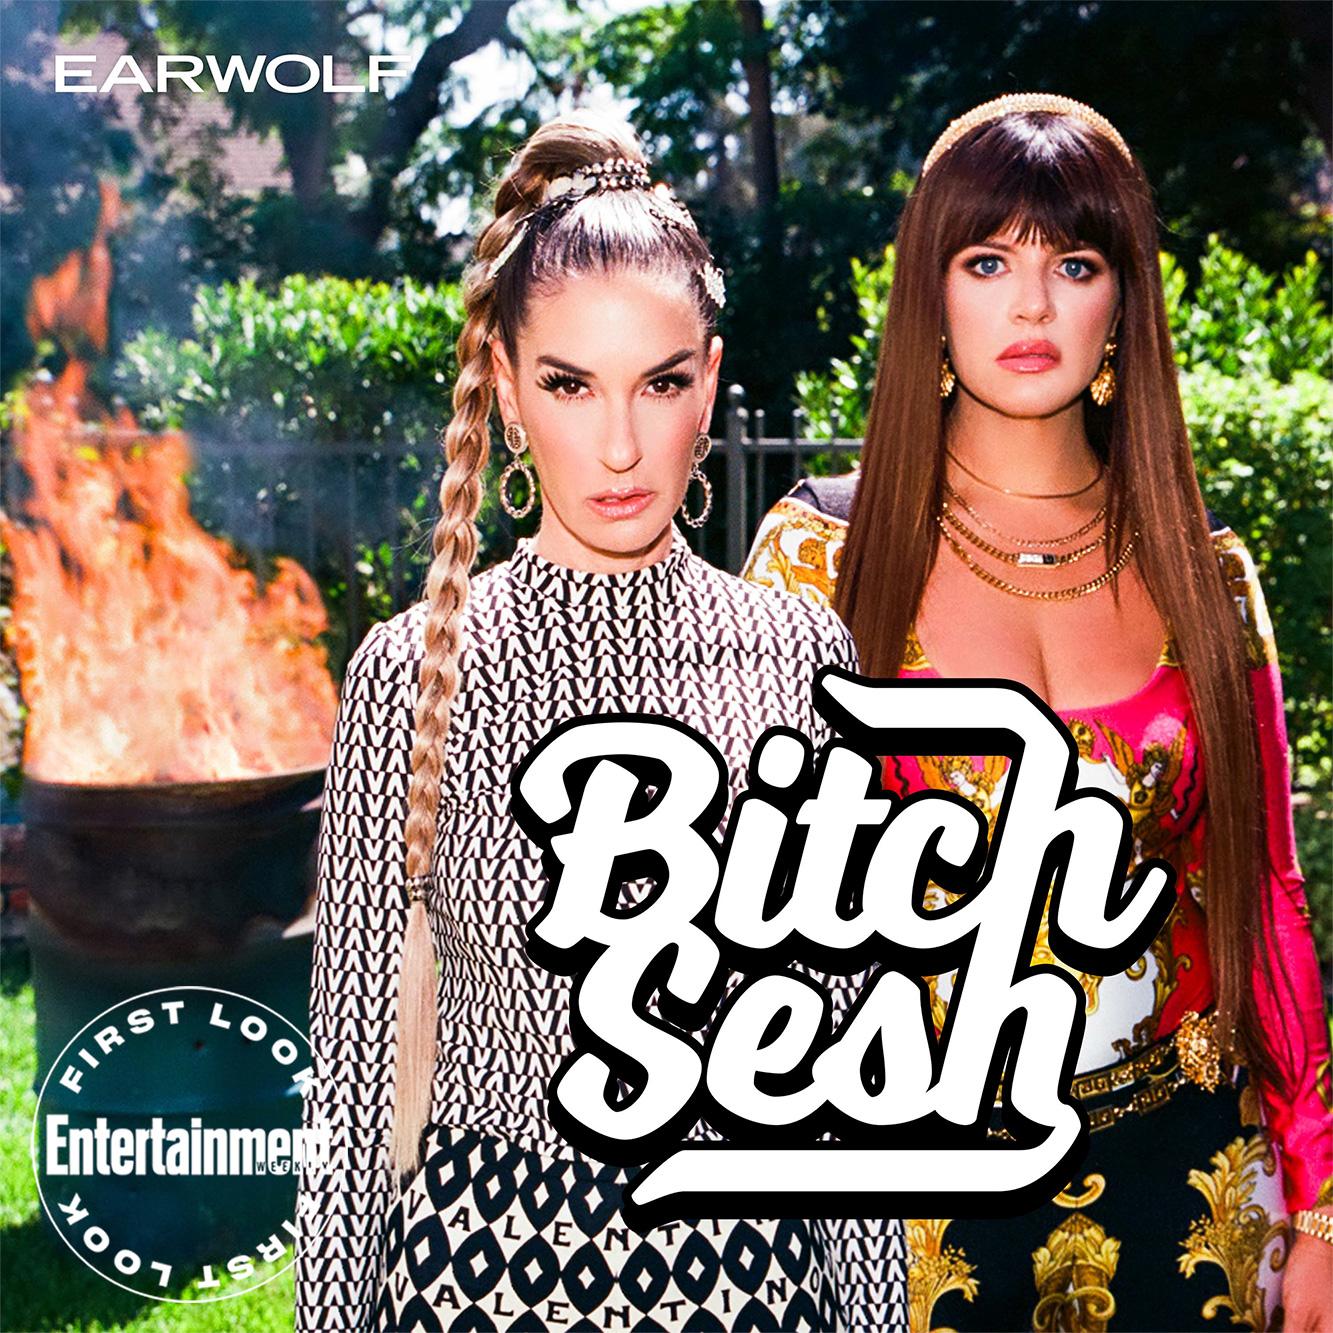 Bitch Sesh